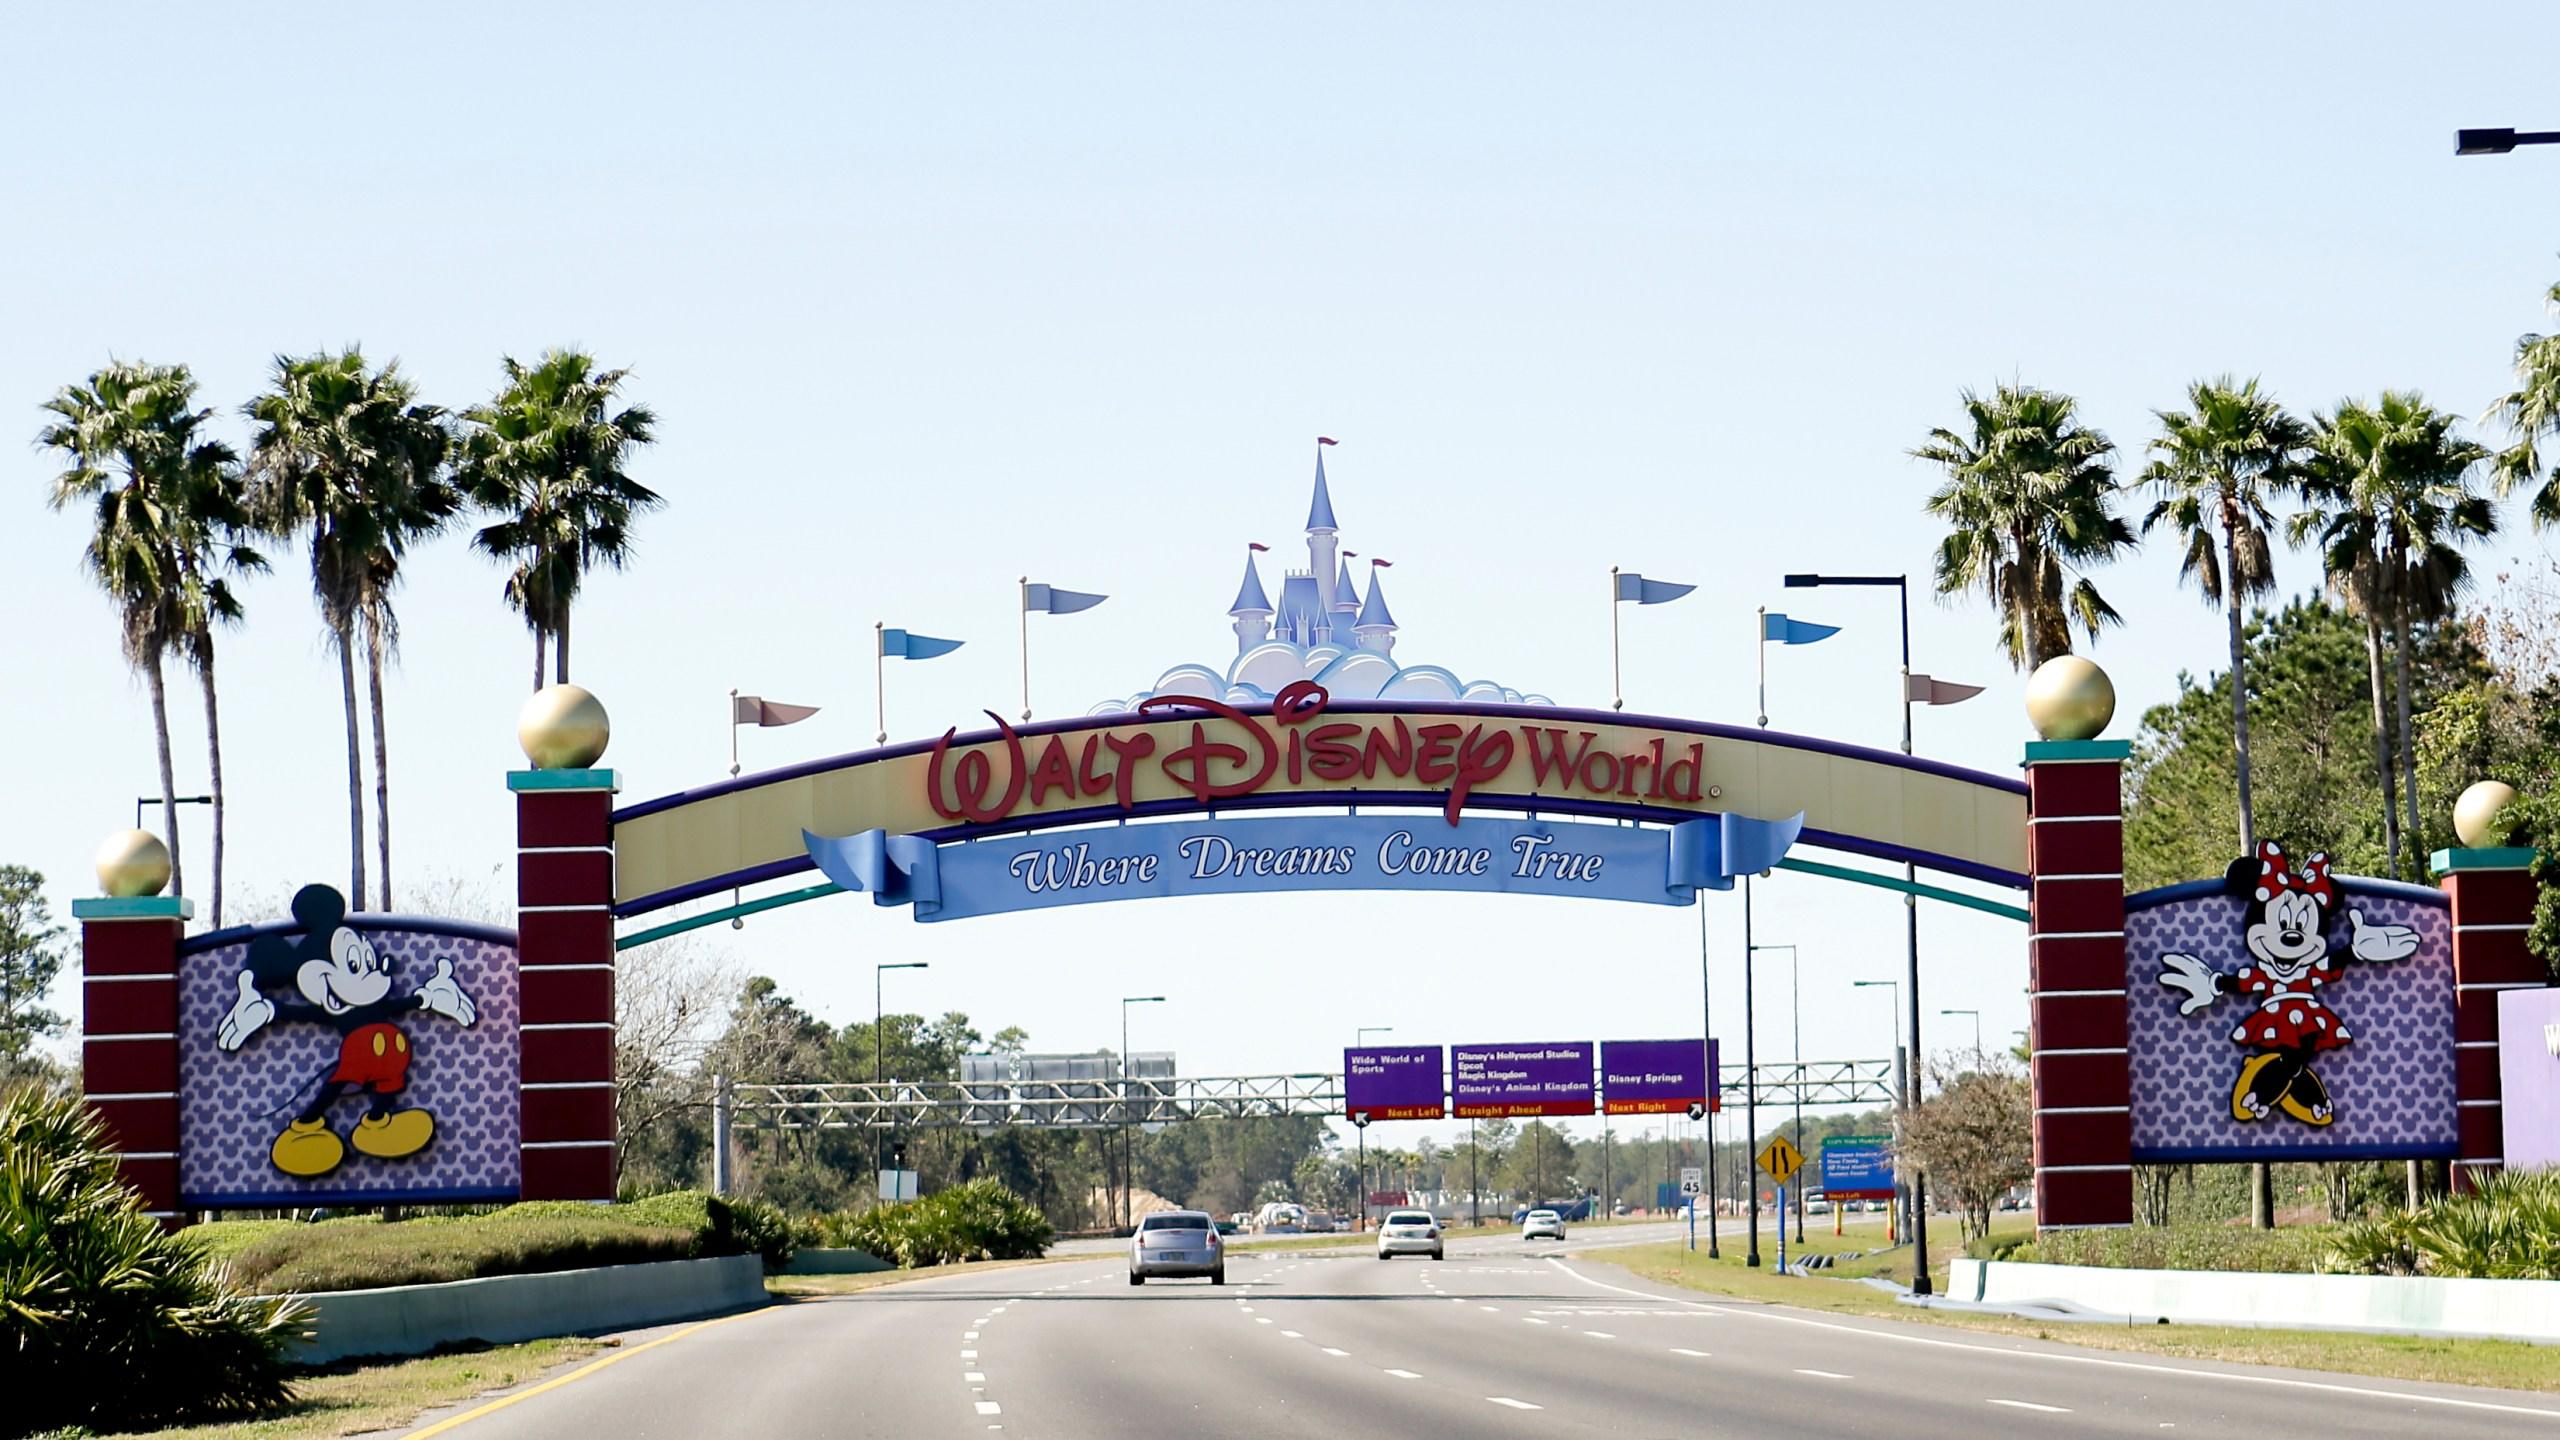 Disney_Lyft_Drivers_Union_22328-159532.jpg31826128